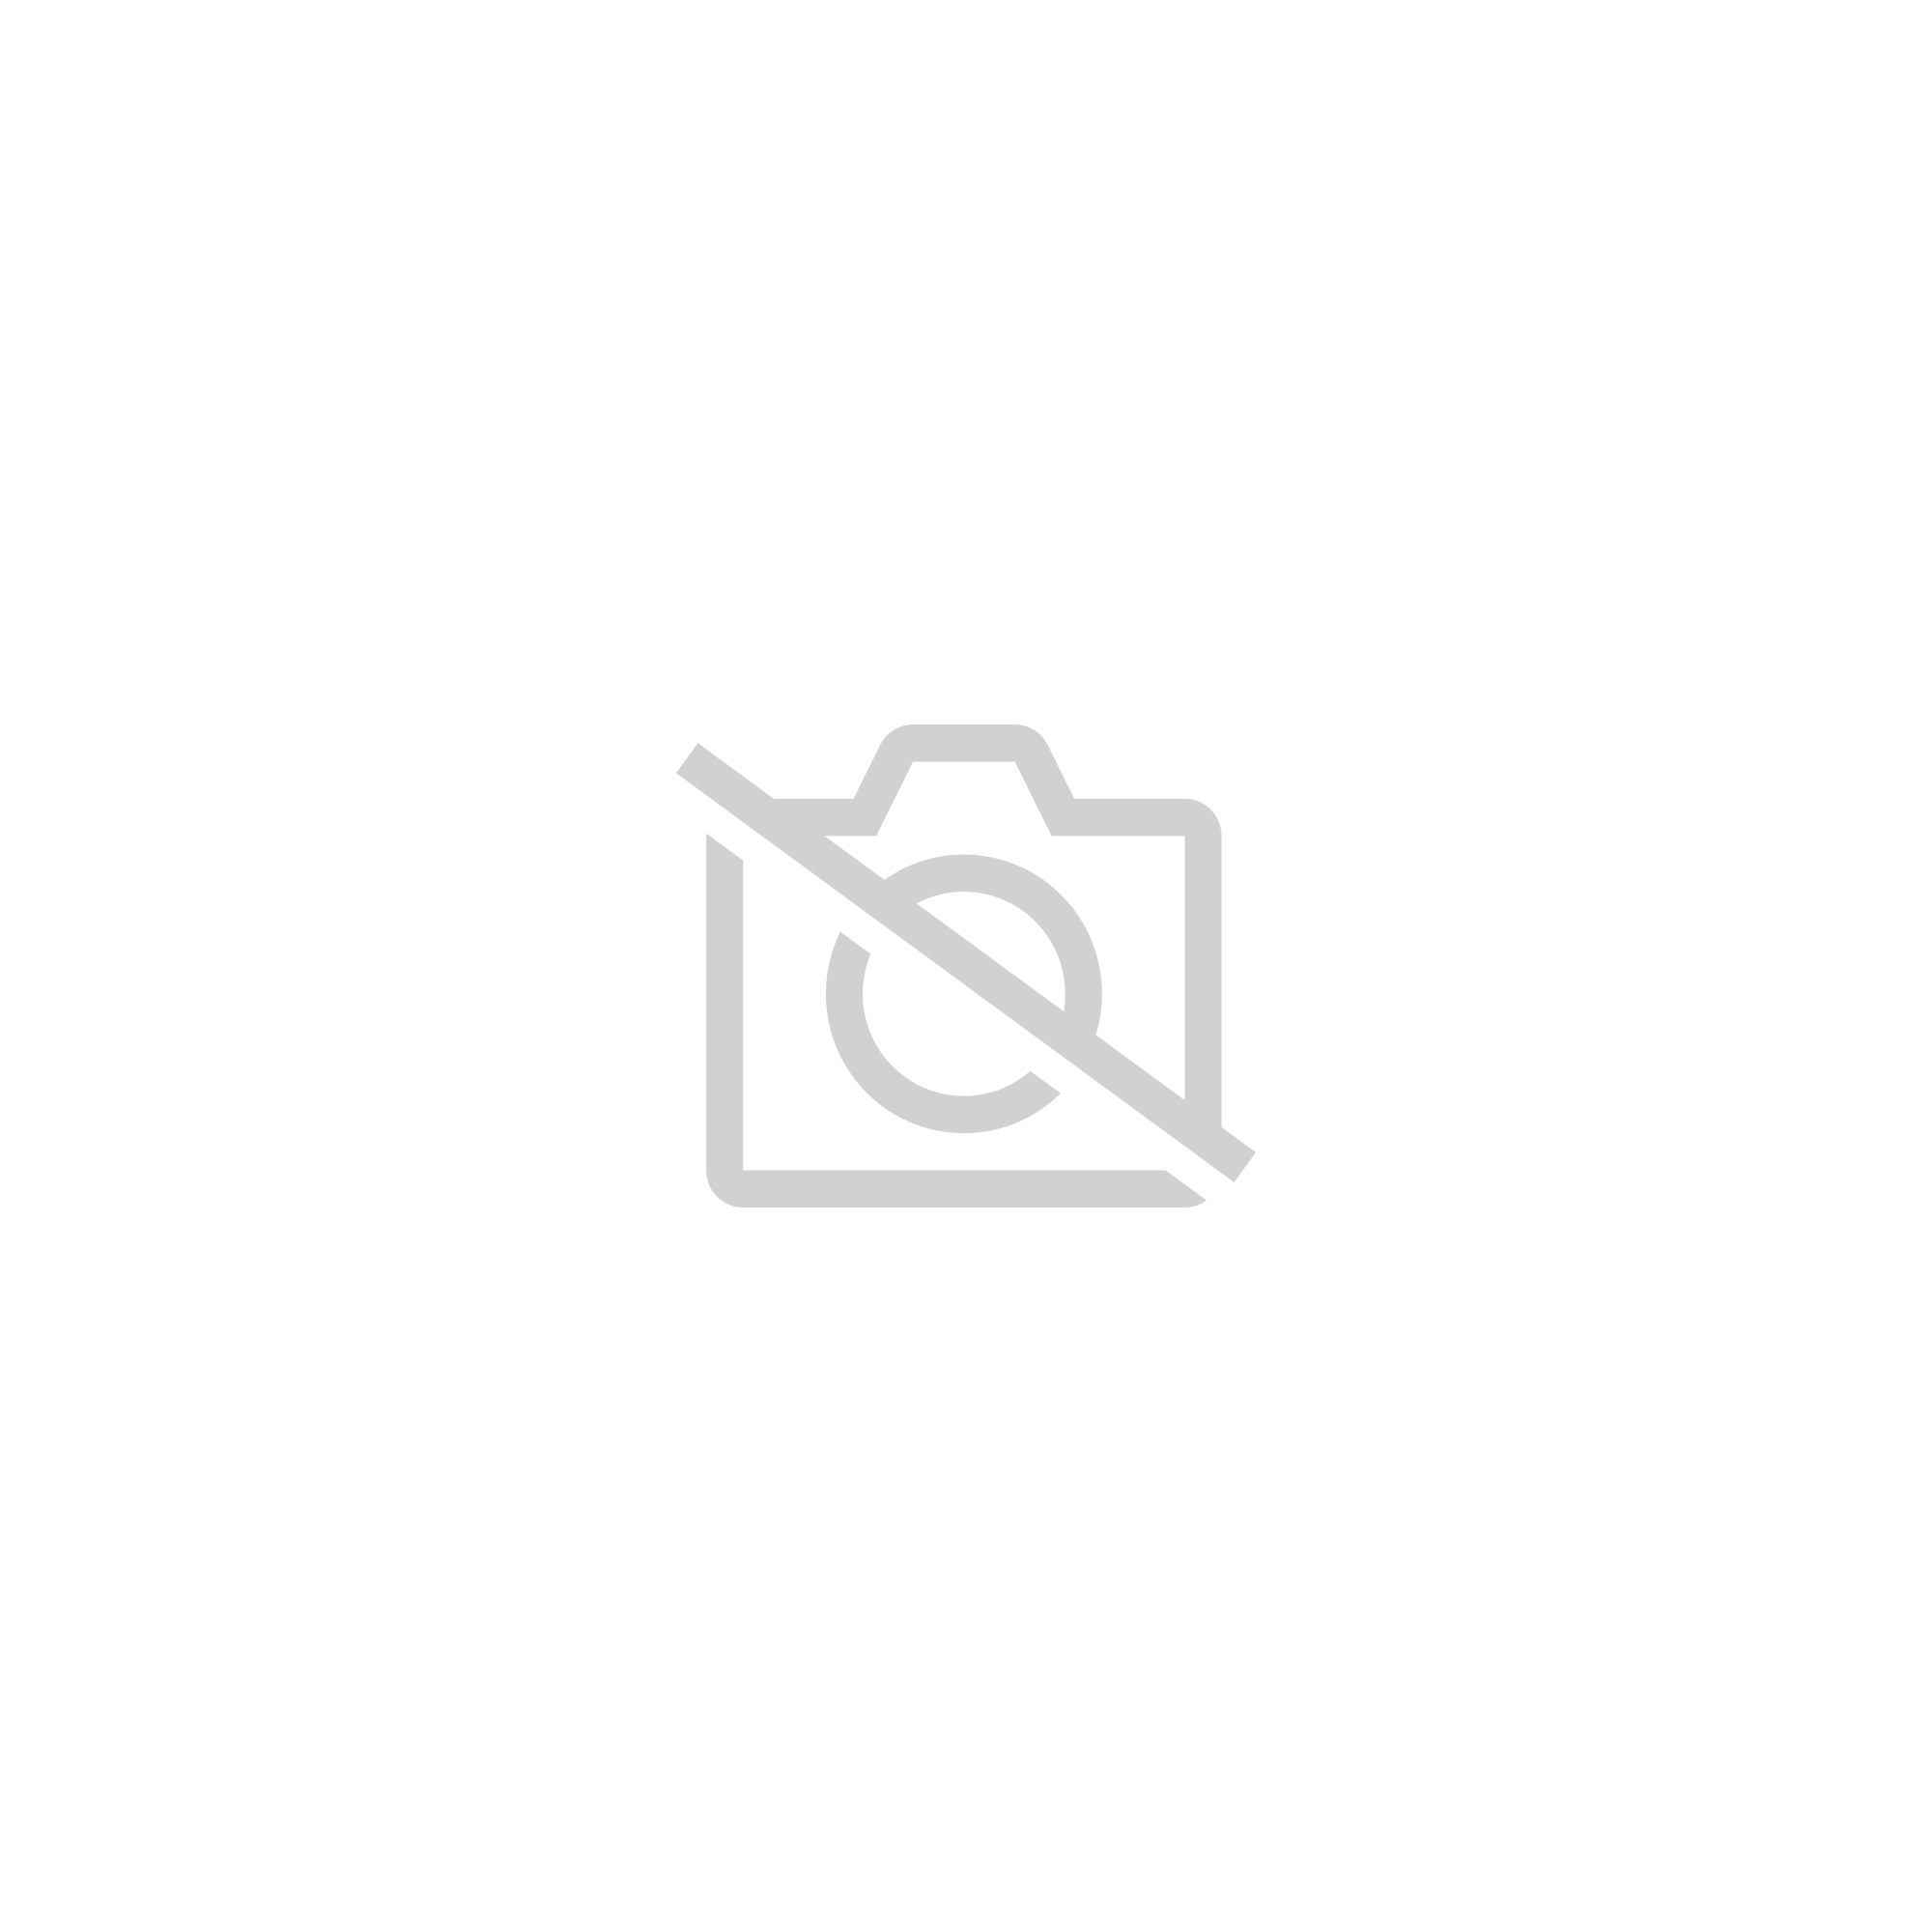 Stylet ISKN Pack stylet pr tablette grap